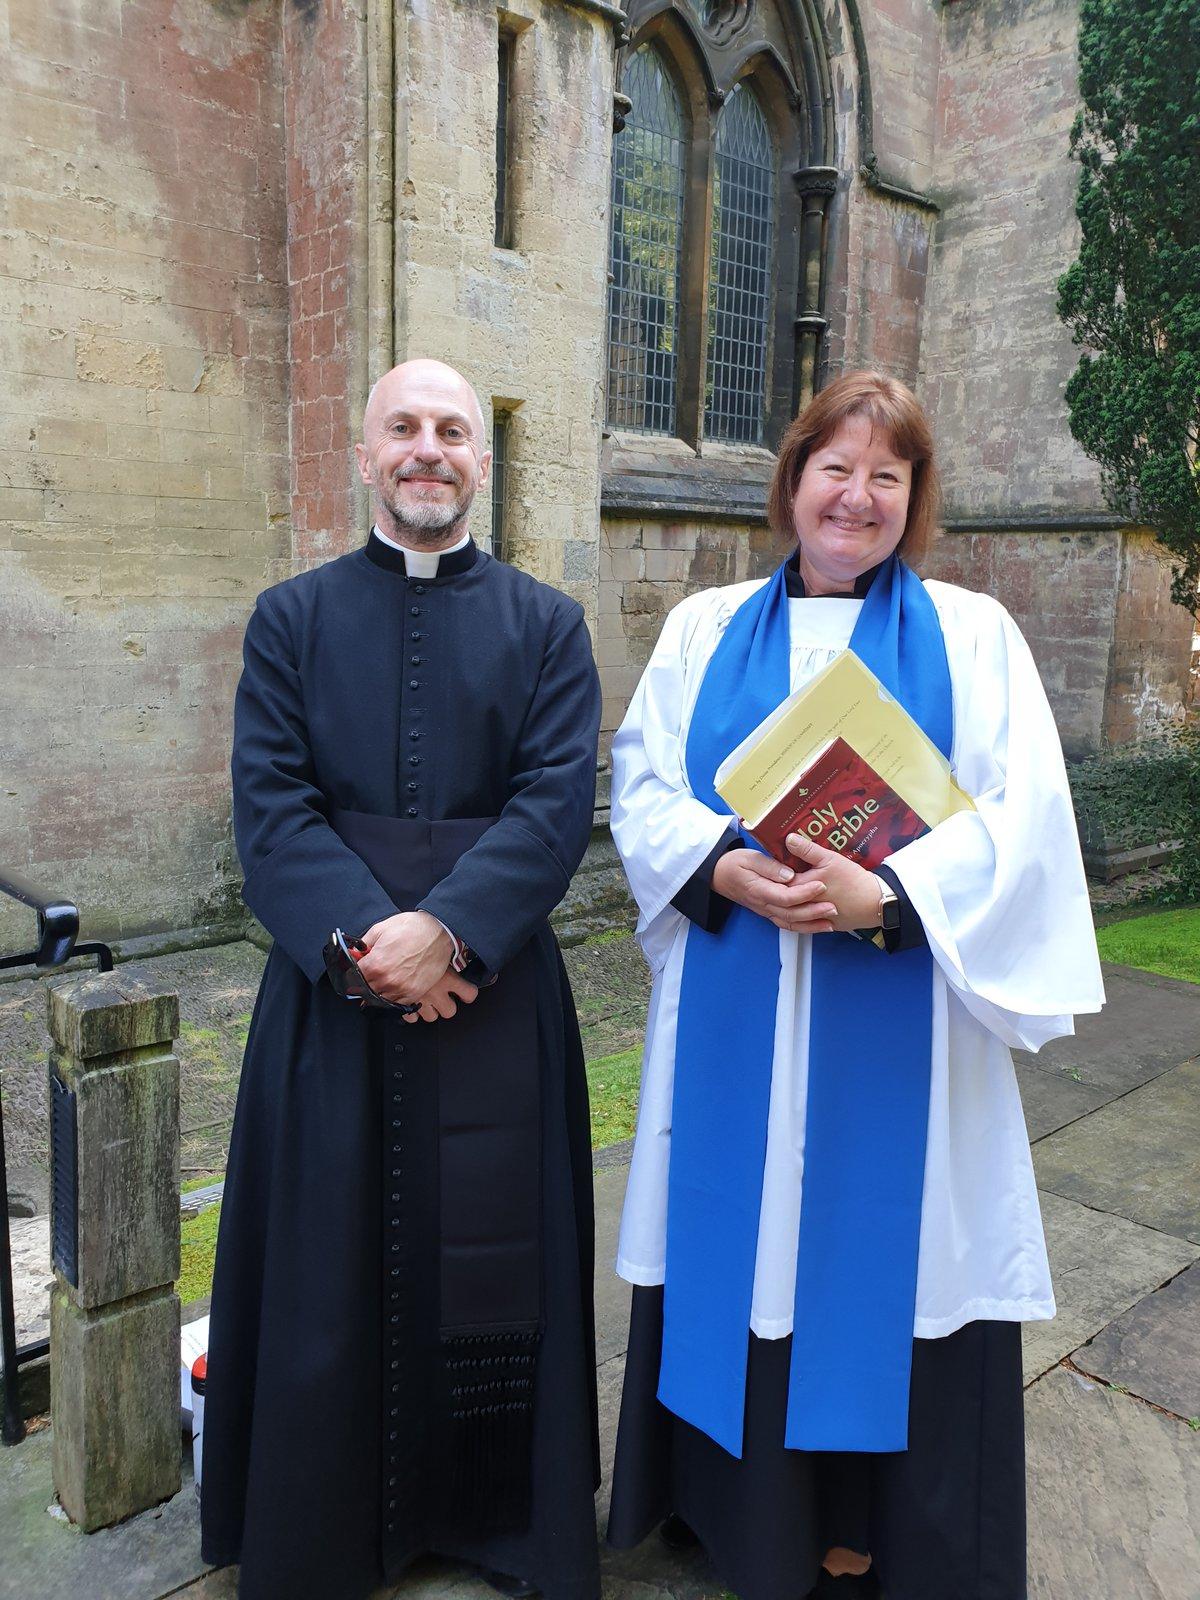 Fr Richard Green and Peta Maidman